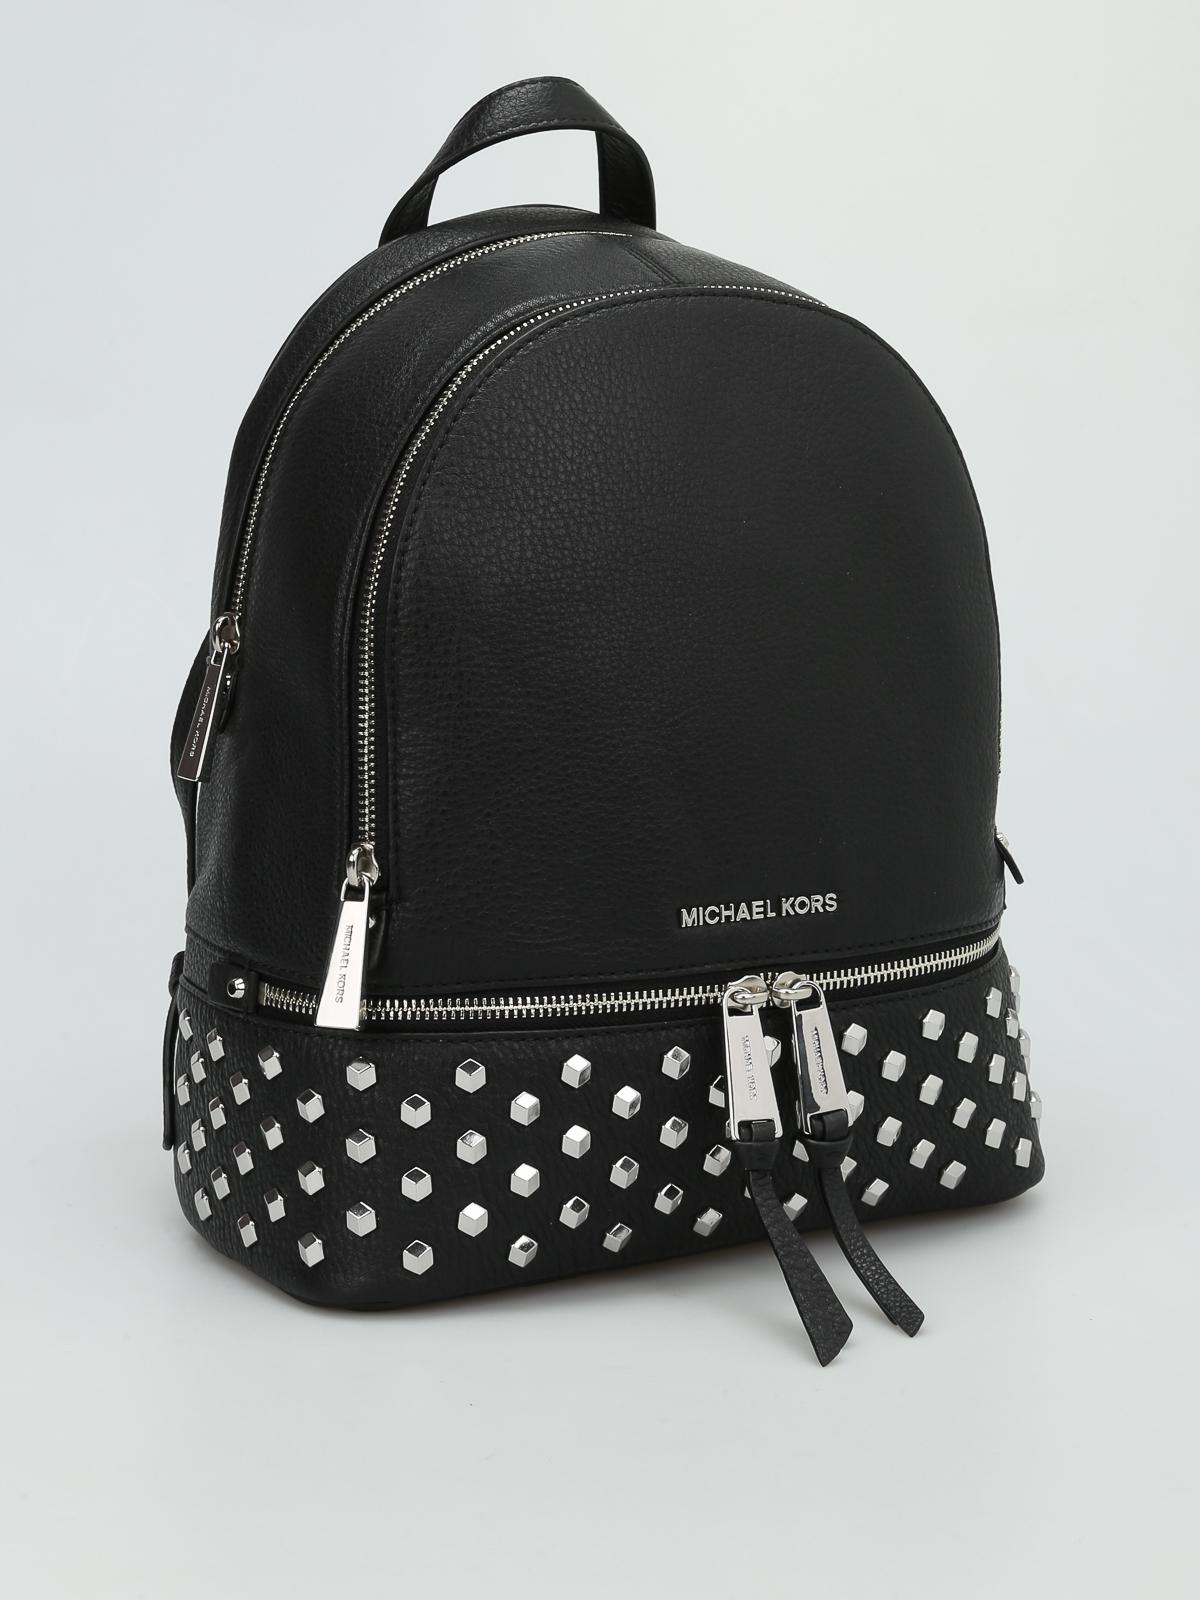 3945a5ac4febf3 Michael Kors - Rhea studded backpack - backpacks - 30S7SEZB2L 001